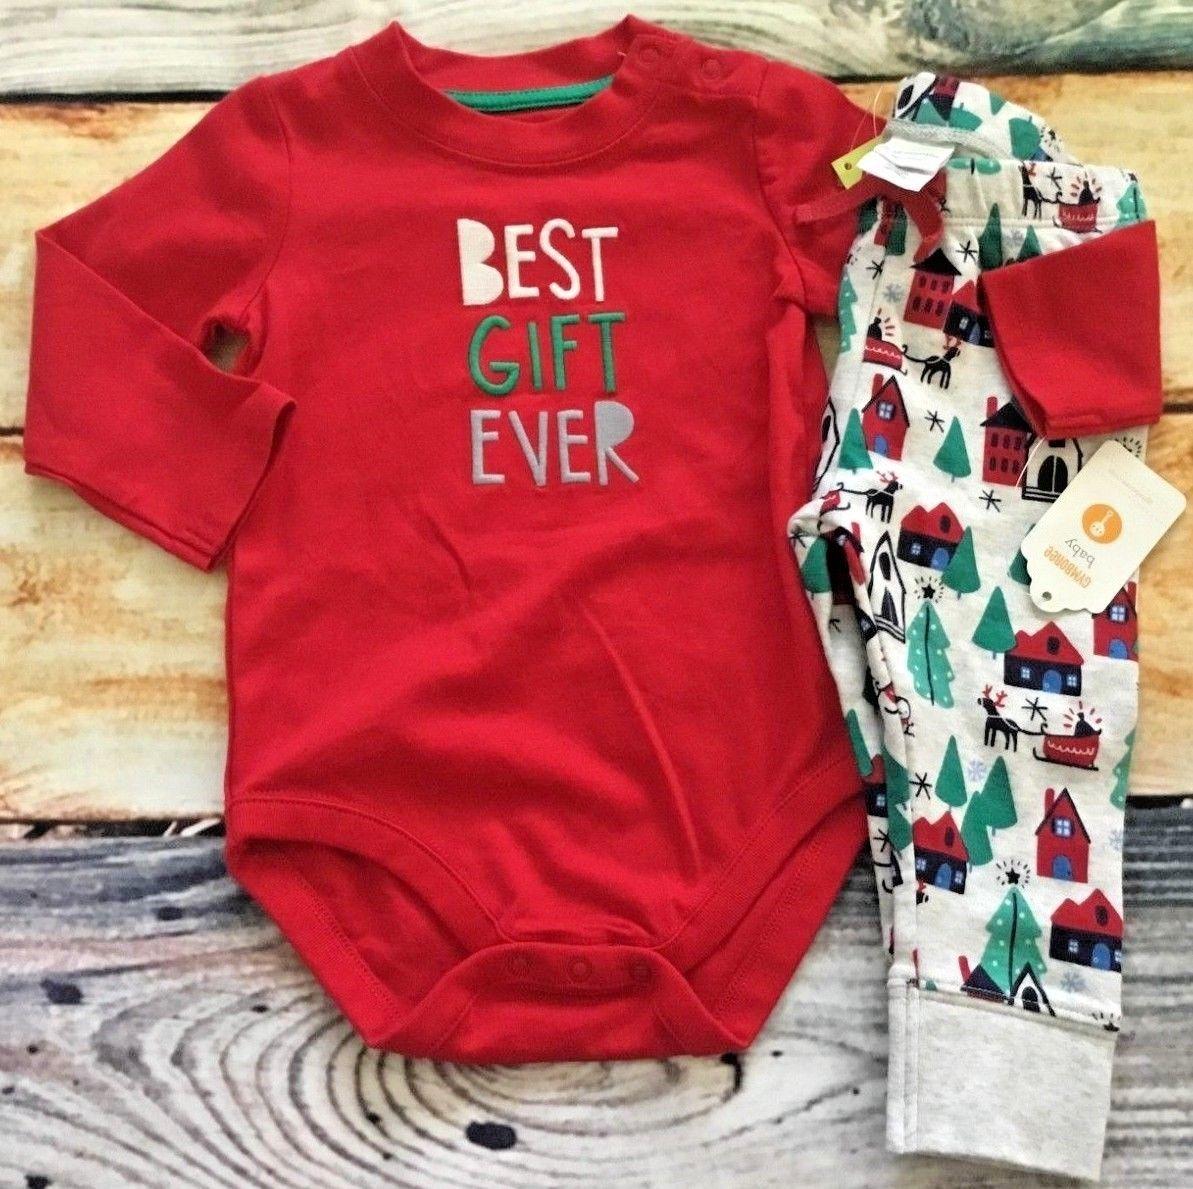 c01250af3 Gymboree Holiday Shop 6-12 Best Gift Ever and 20 similar items. 57